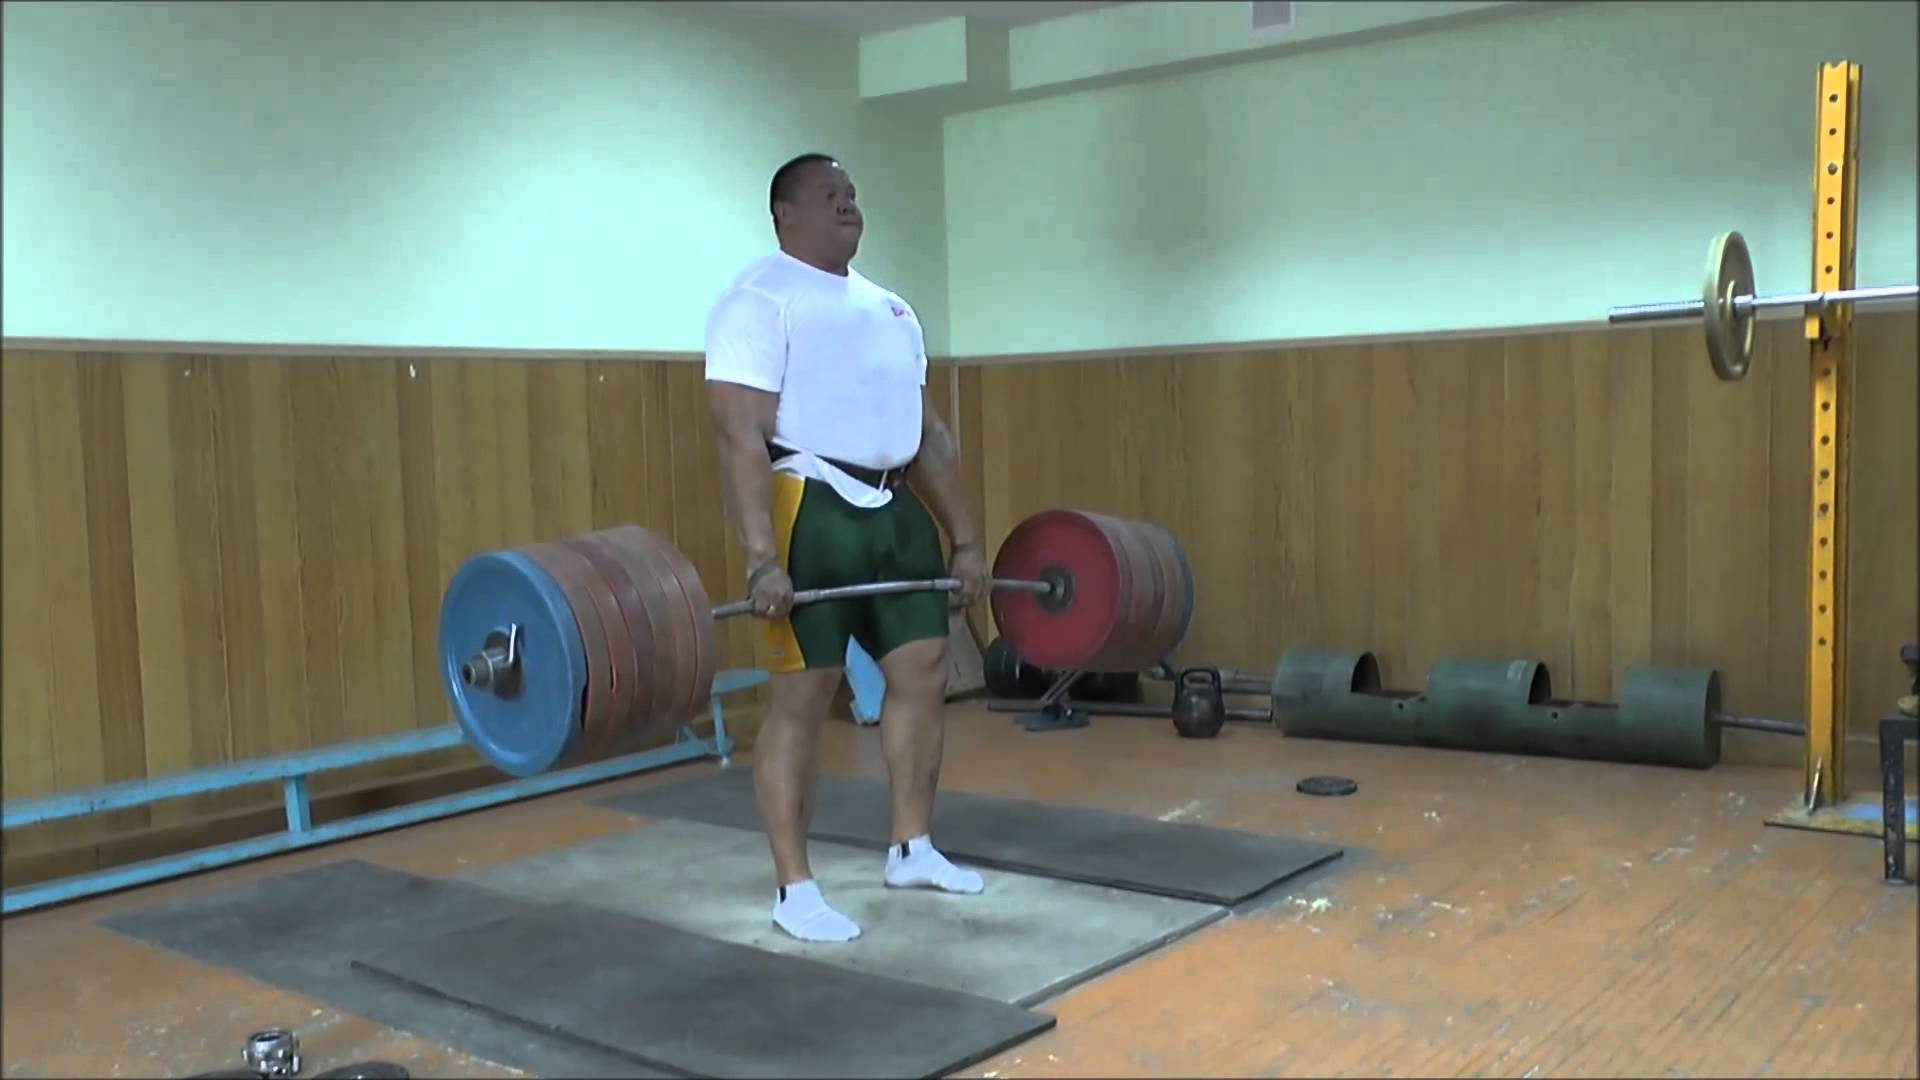 mikhail-koklyaev-362-5kg-x9-deadlift.jpg